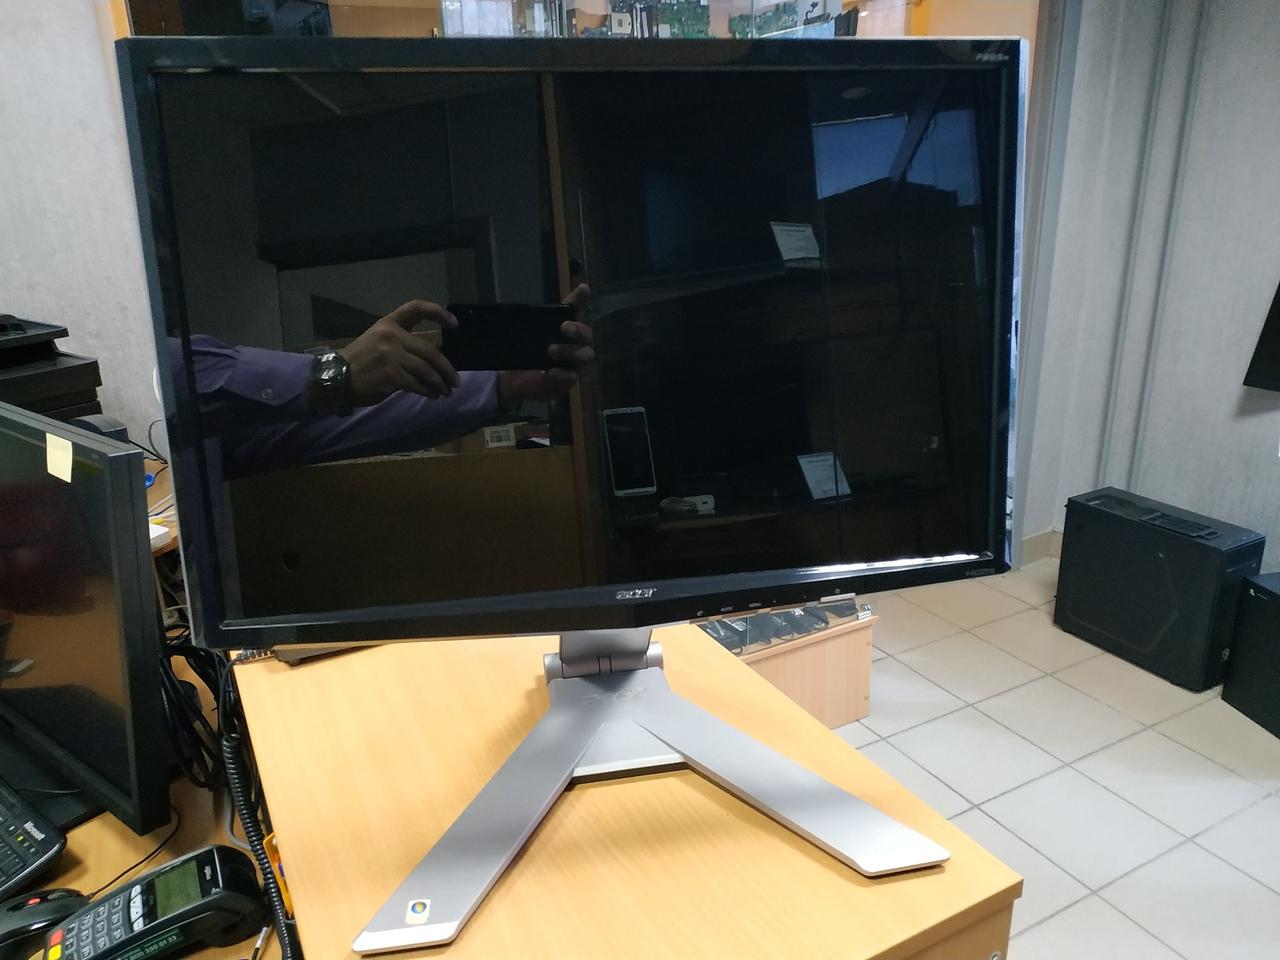 монитор Acer P223W | фото 1 из 1